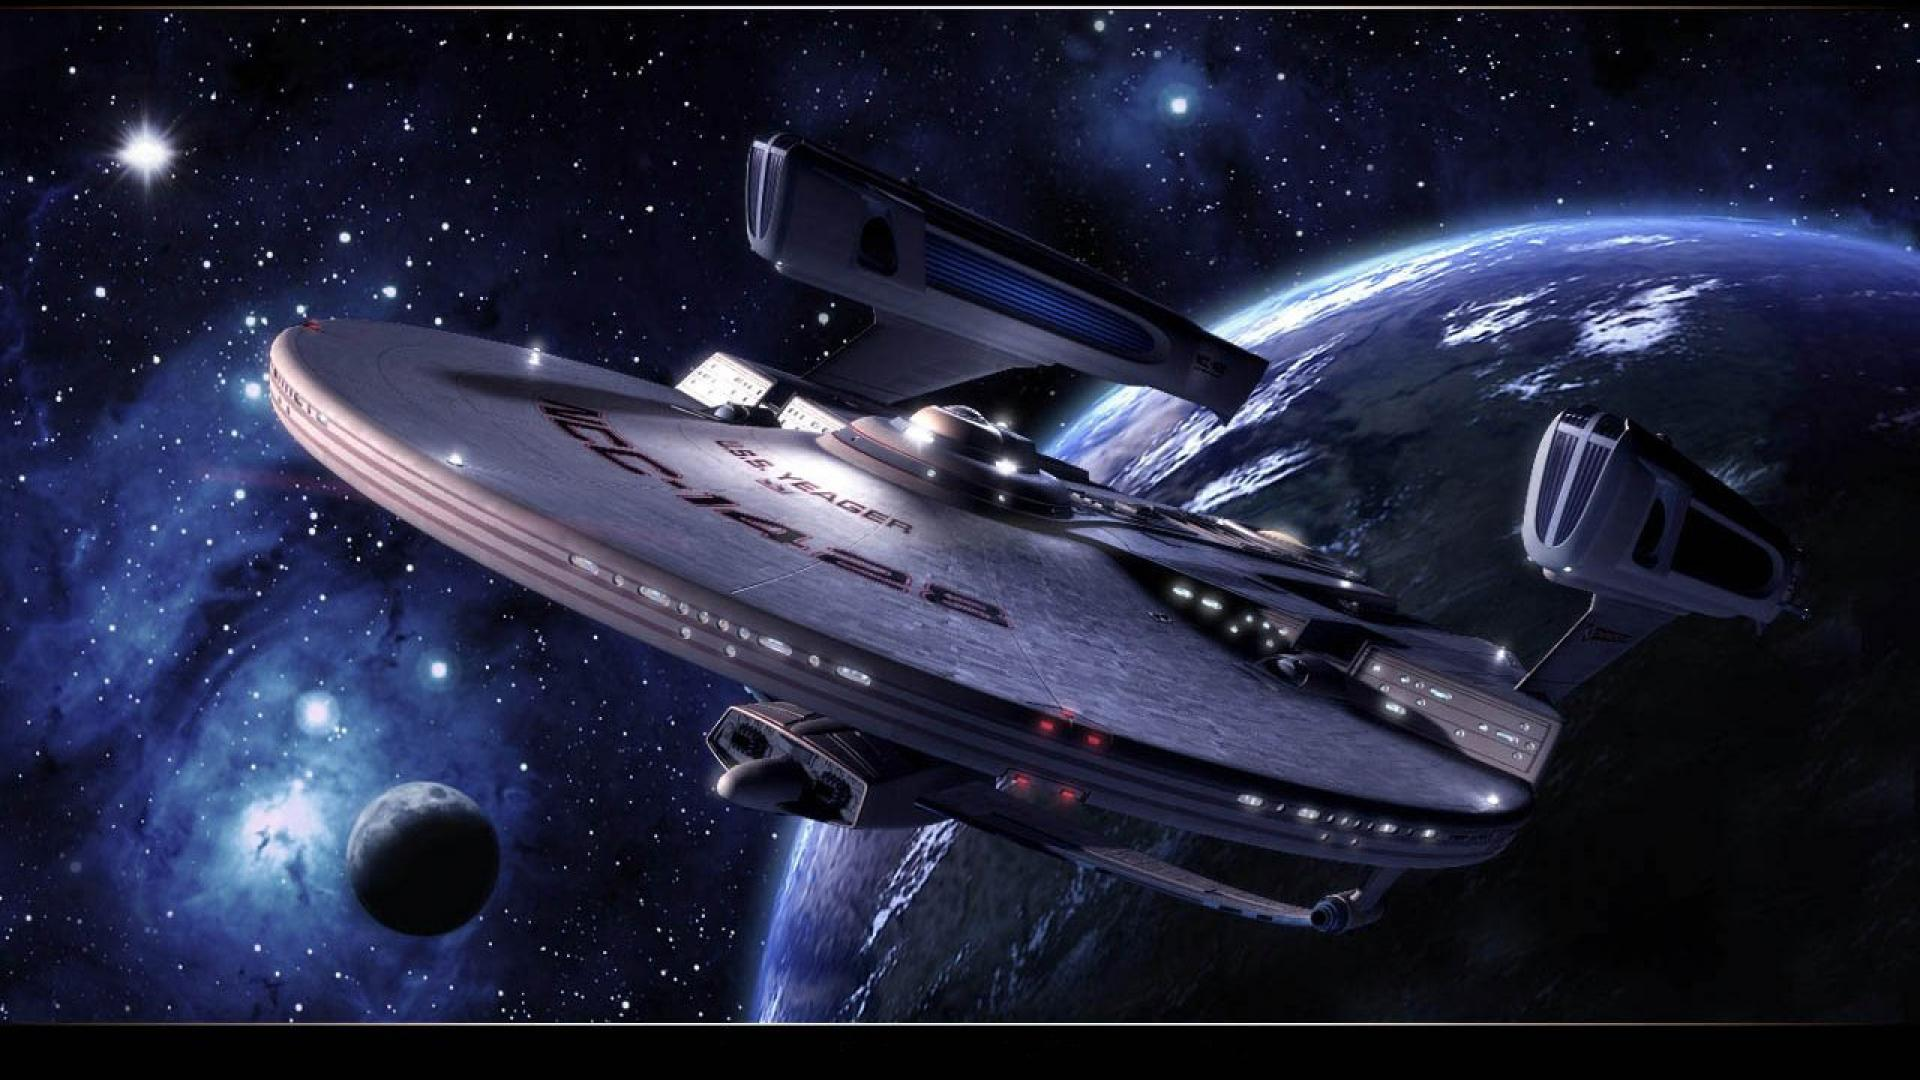 Star Trek Wallpaper High Resolution 1920x1080